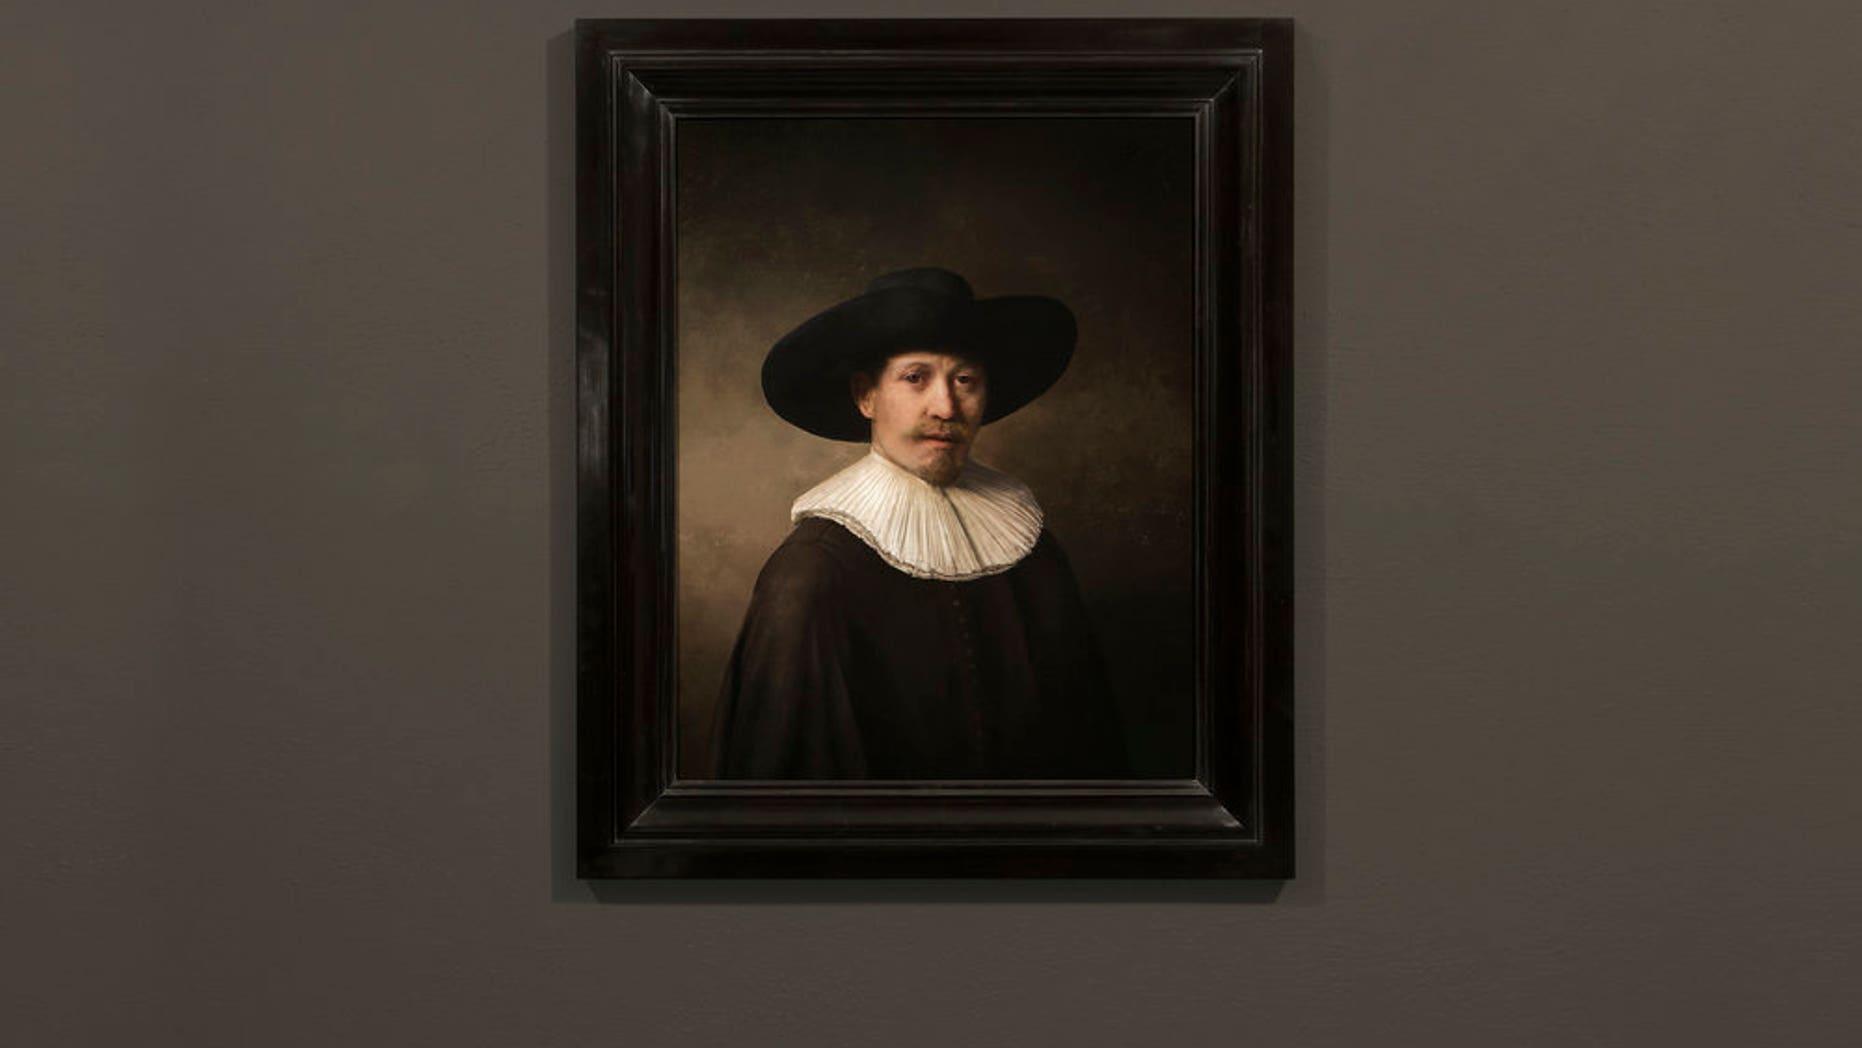 (The Next Rembrandt)